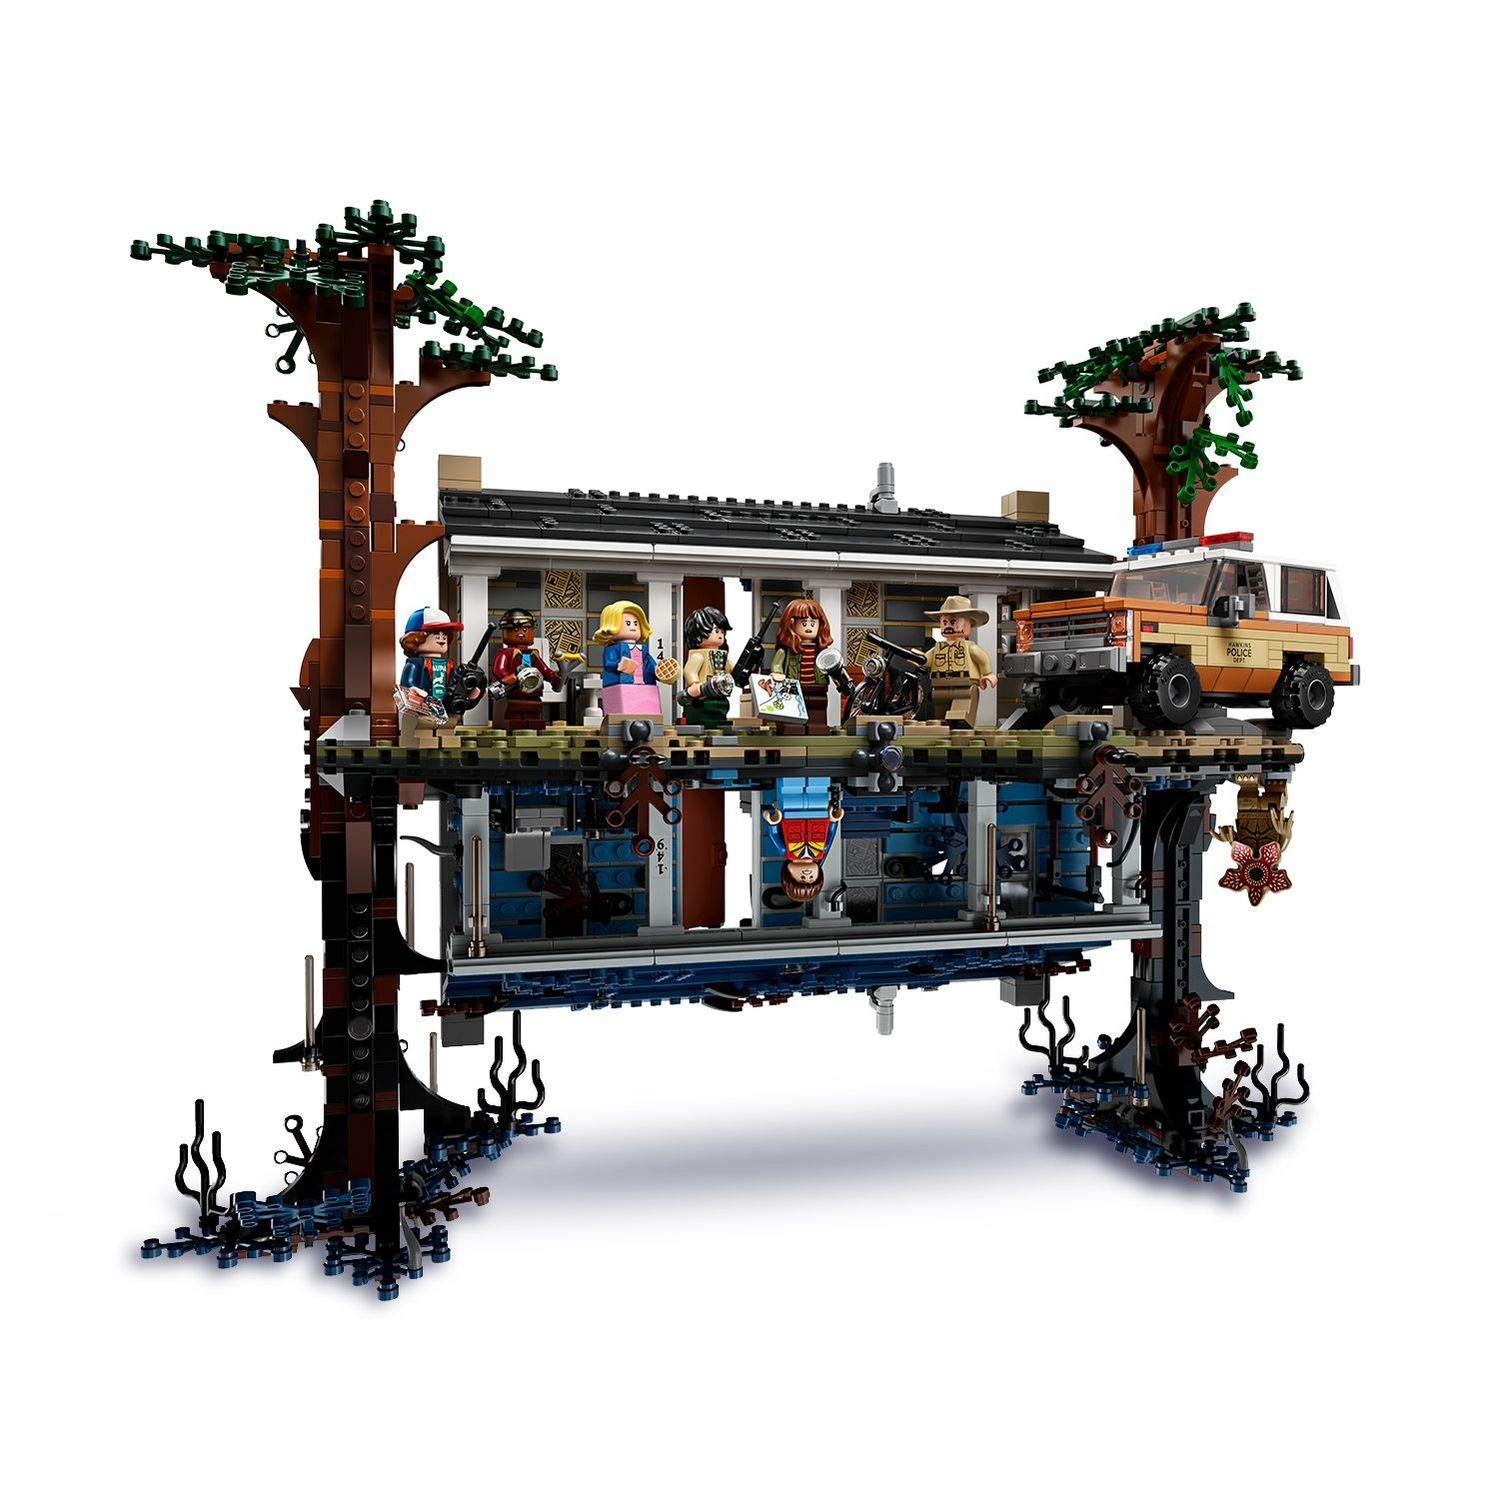 El increíble Set de Stranger Things de LEGO